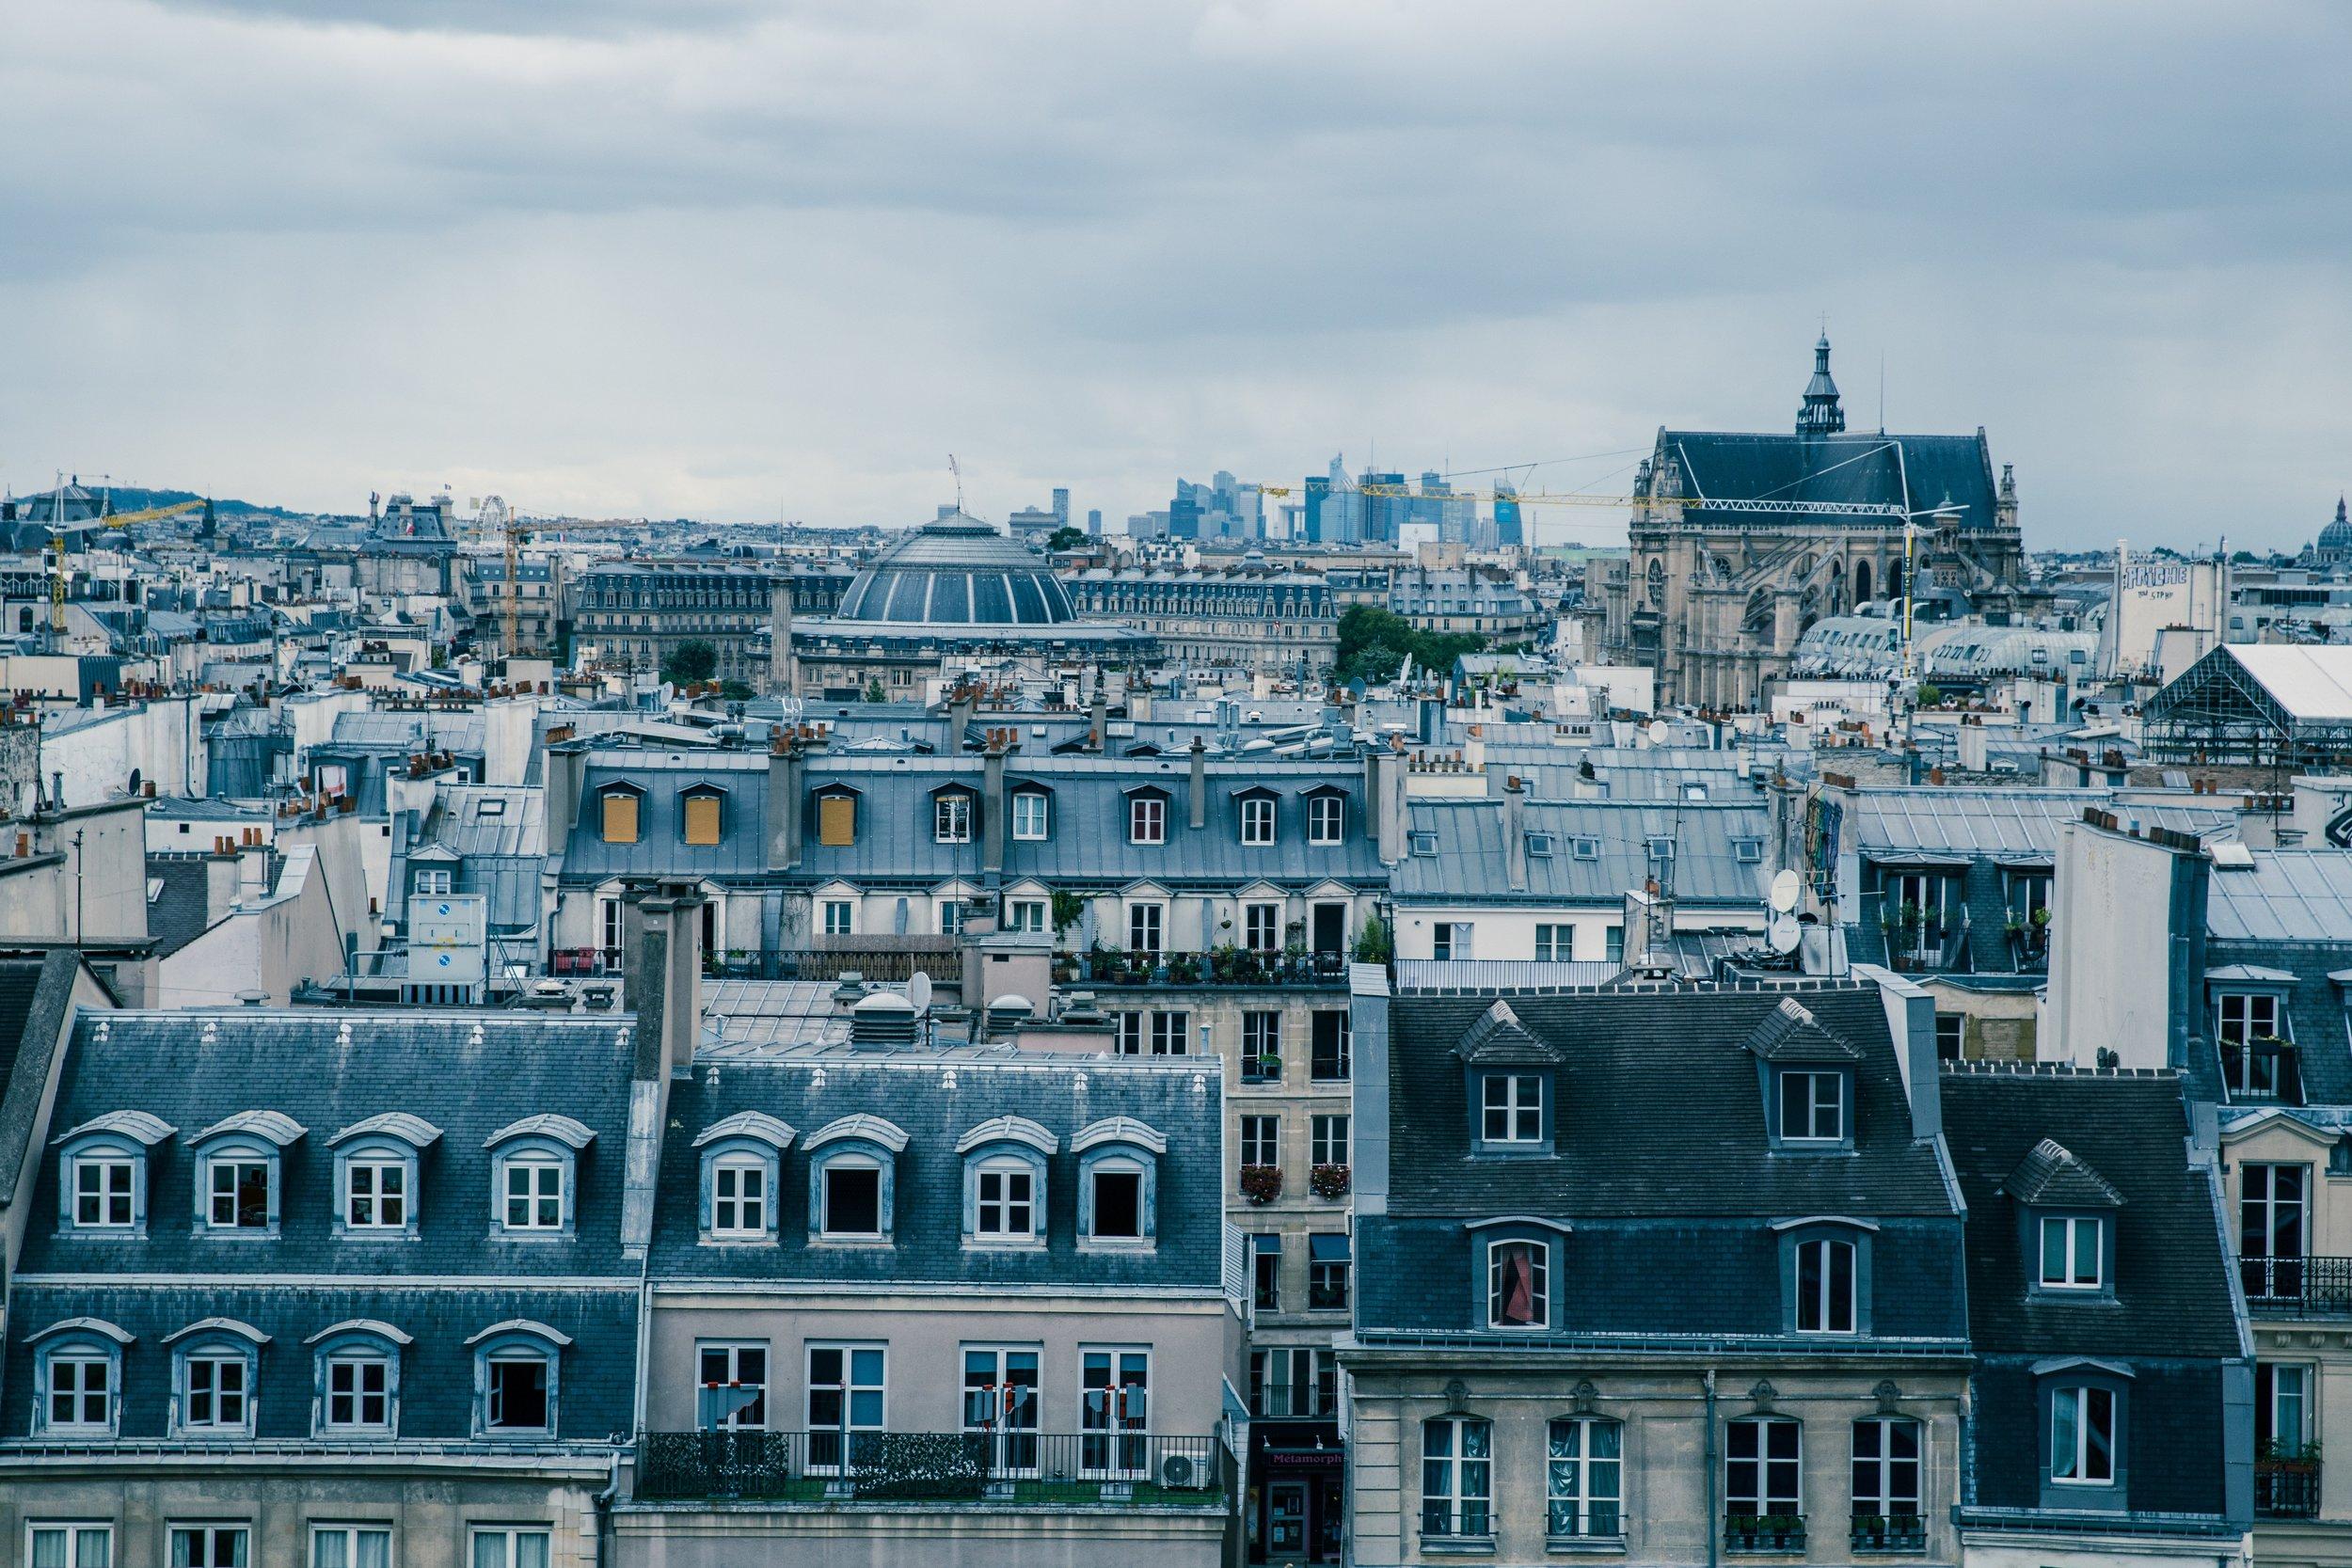 Moving to Paris by @alessia_gandolfo on Instagram